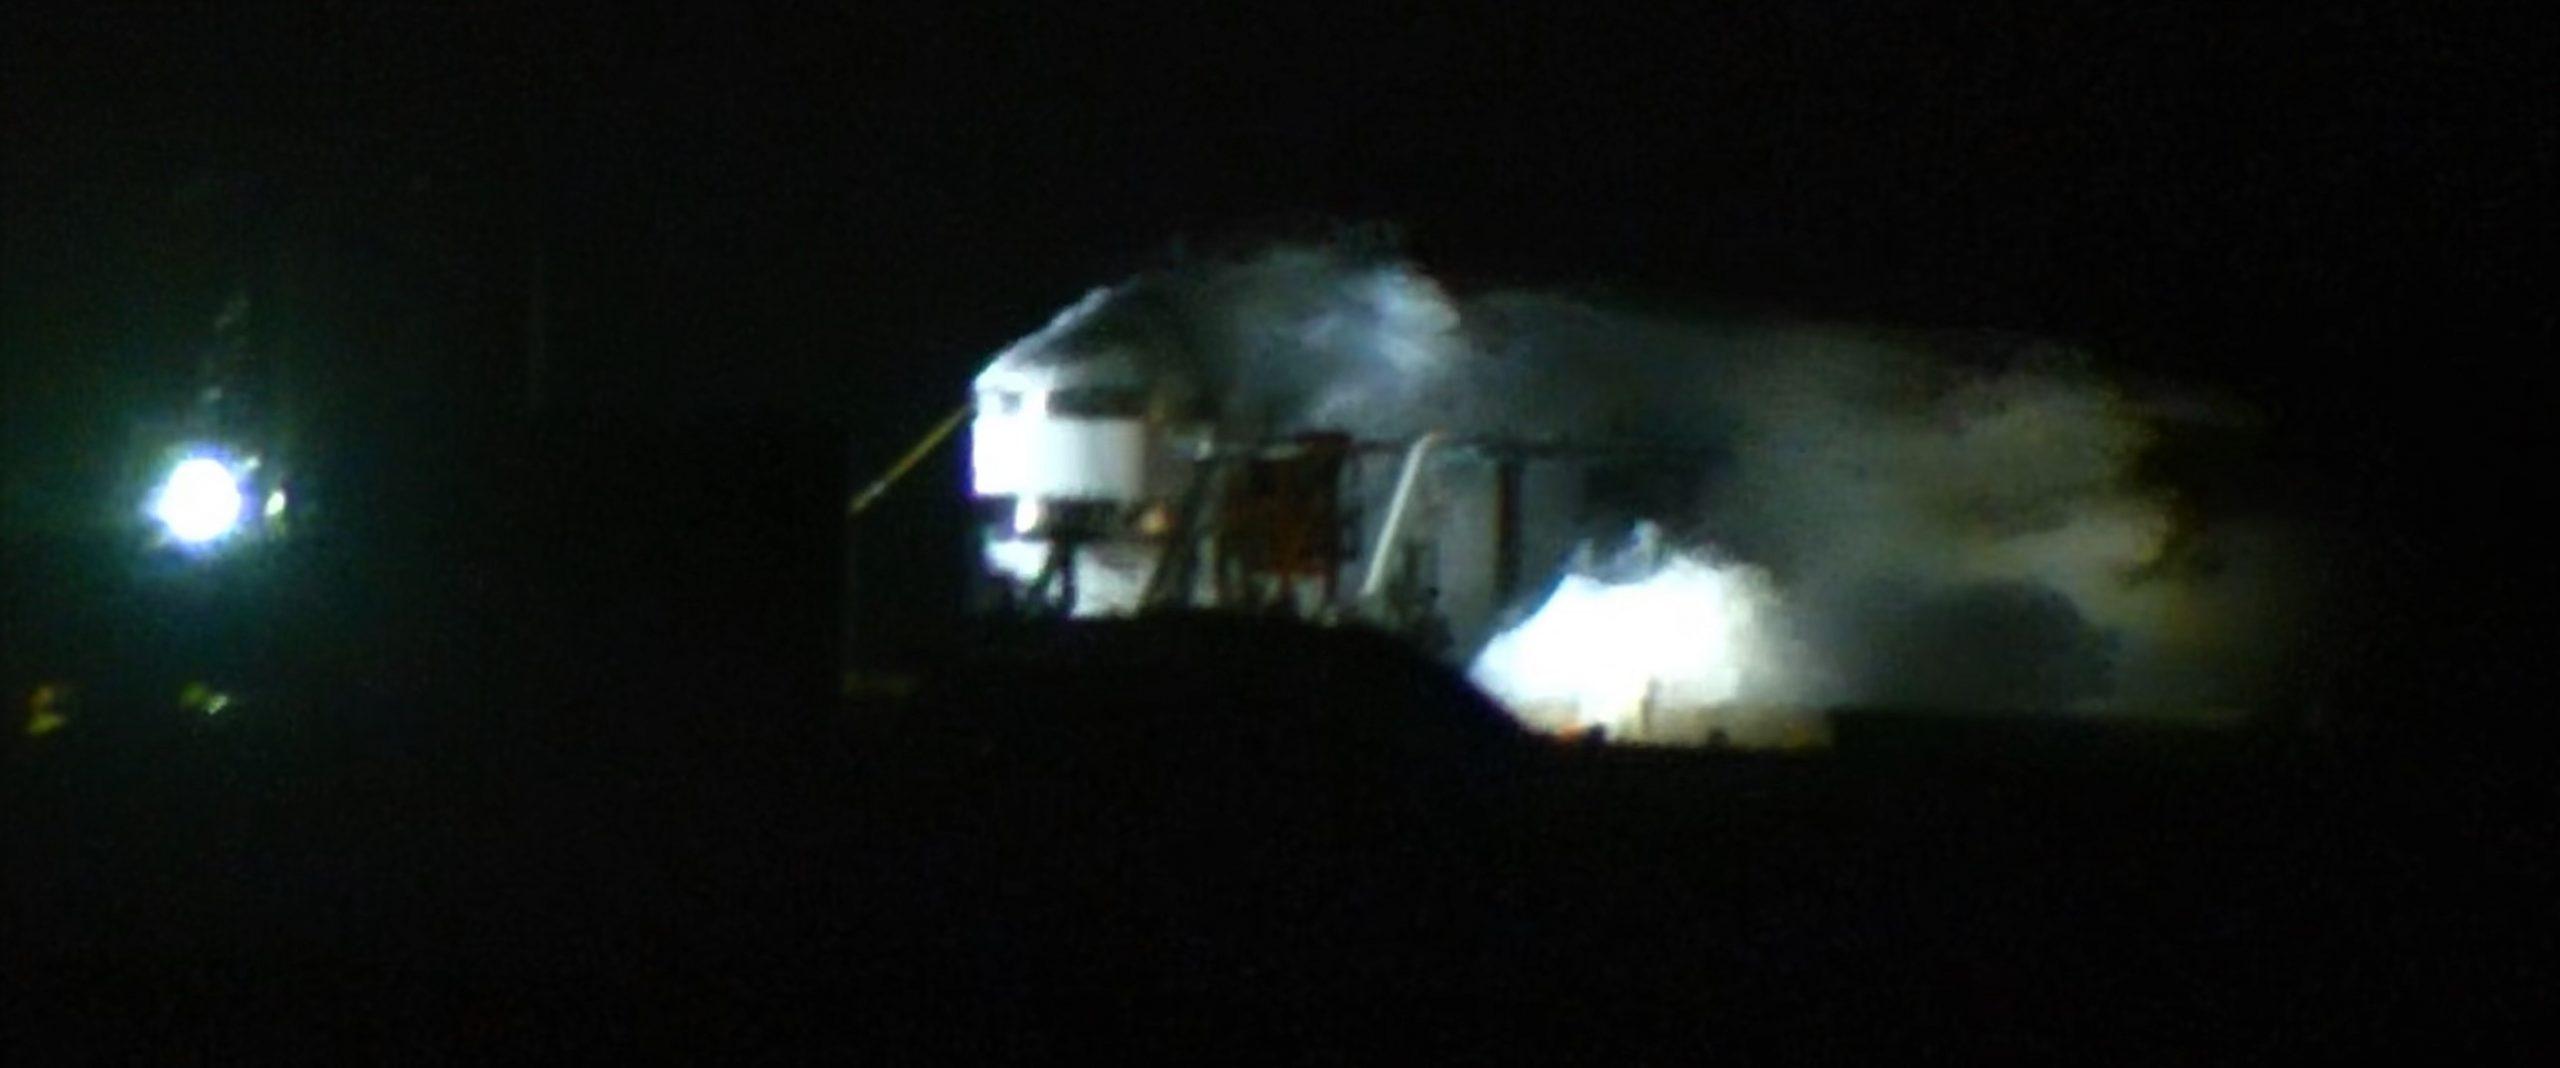 Starship test tank #2 012820 (LabPadre) 1